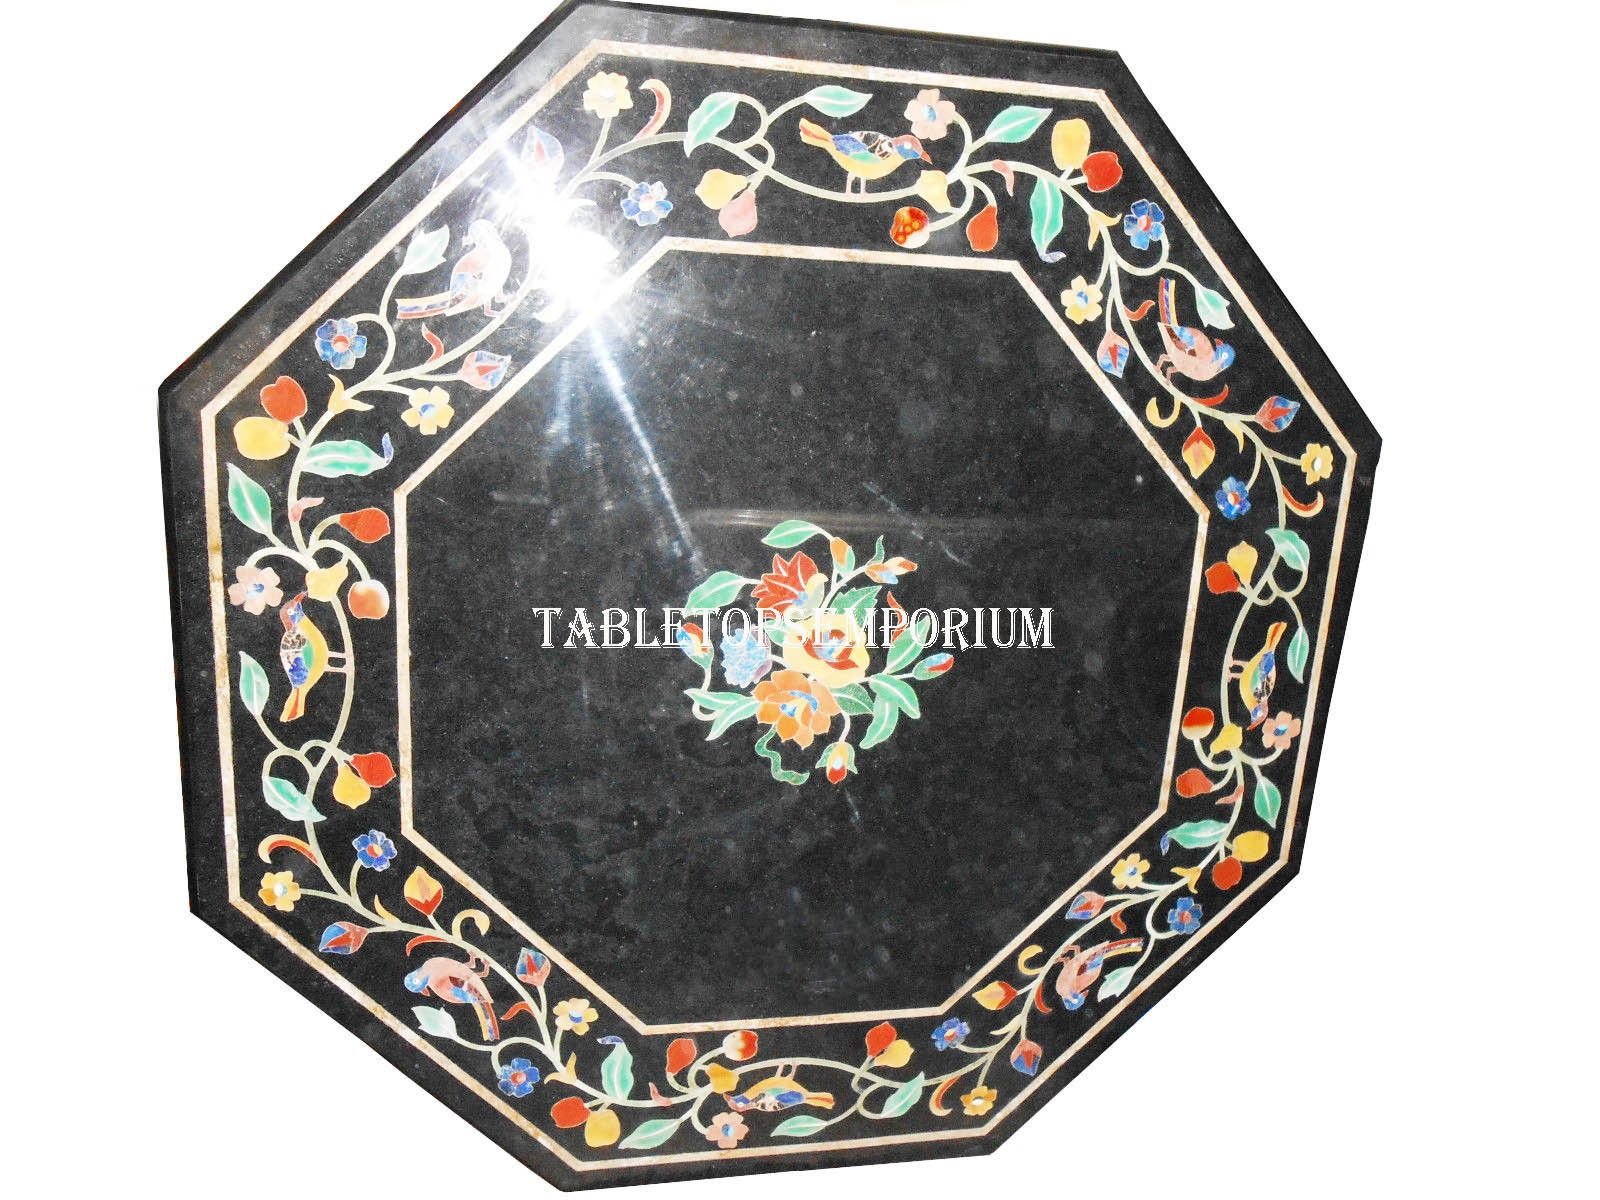 "15"" Black Marble Coffee Center Table Top Floral Art Inlay Semi Precious Decor https://t.co/6lHl0tvmlN https://t.co/RyWauezxG4"